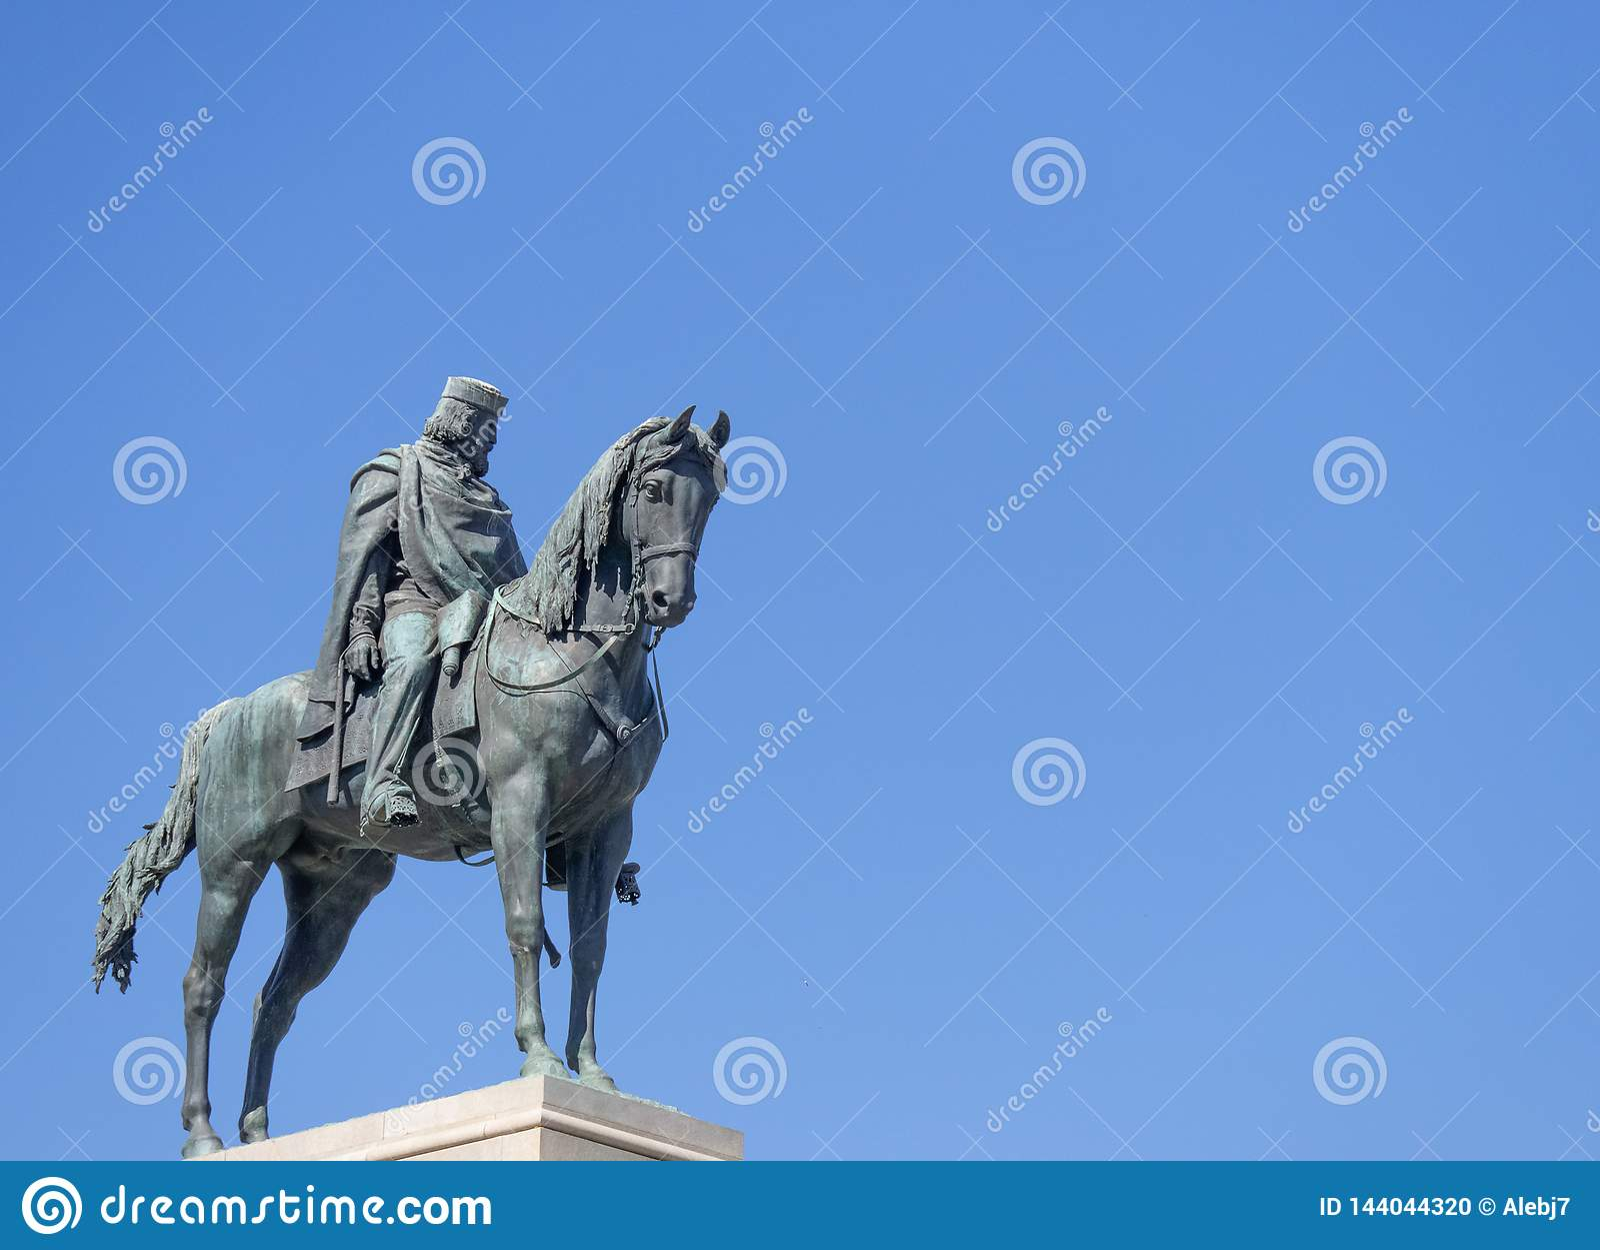 Standbeeld van Giuseppe Garibaldi